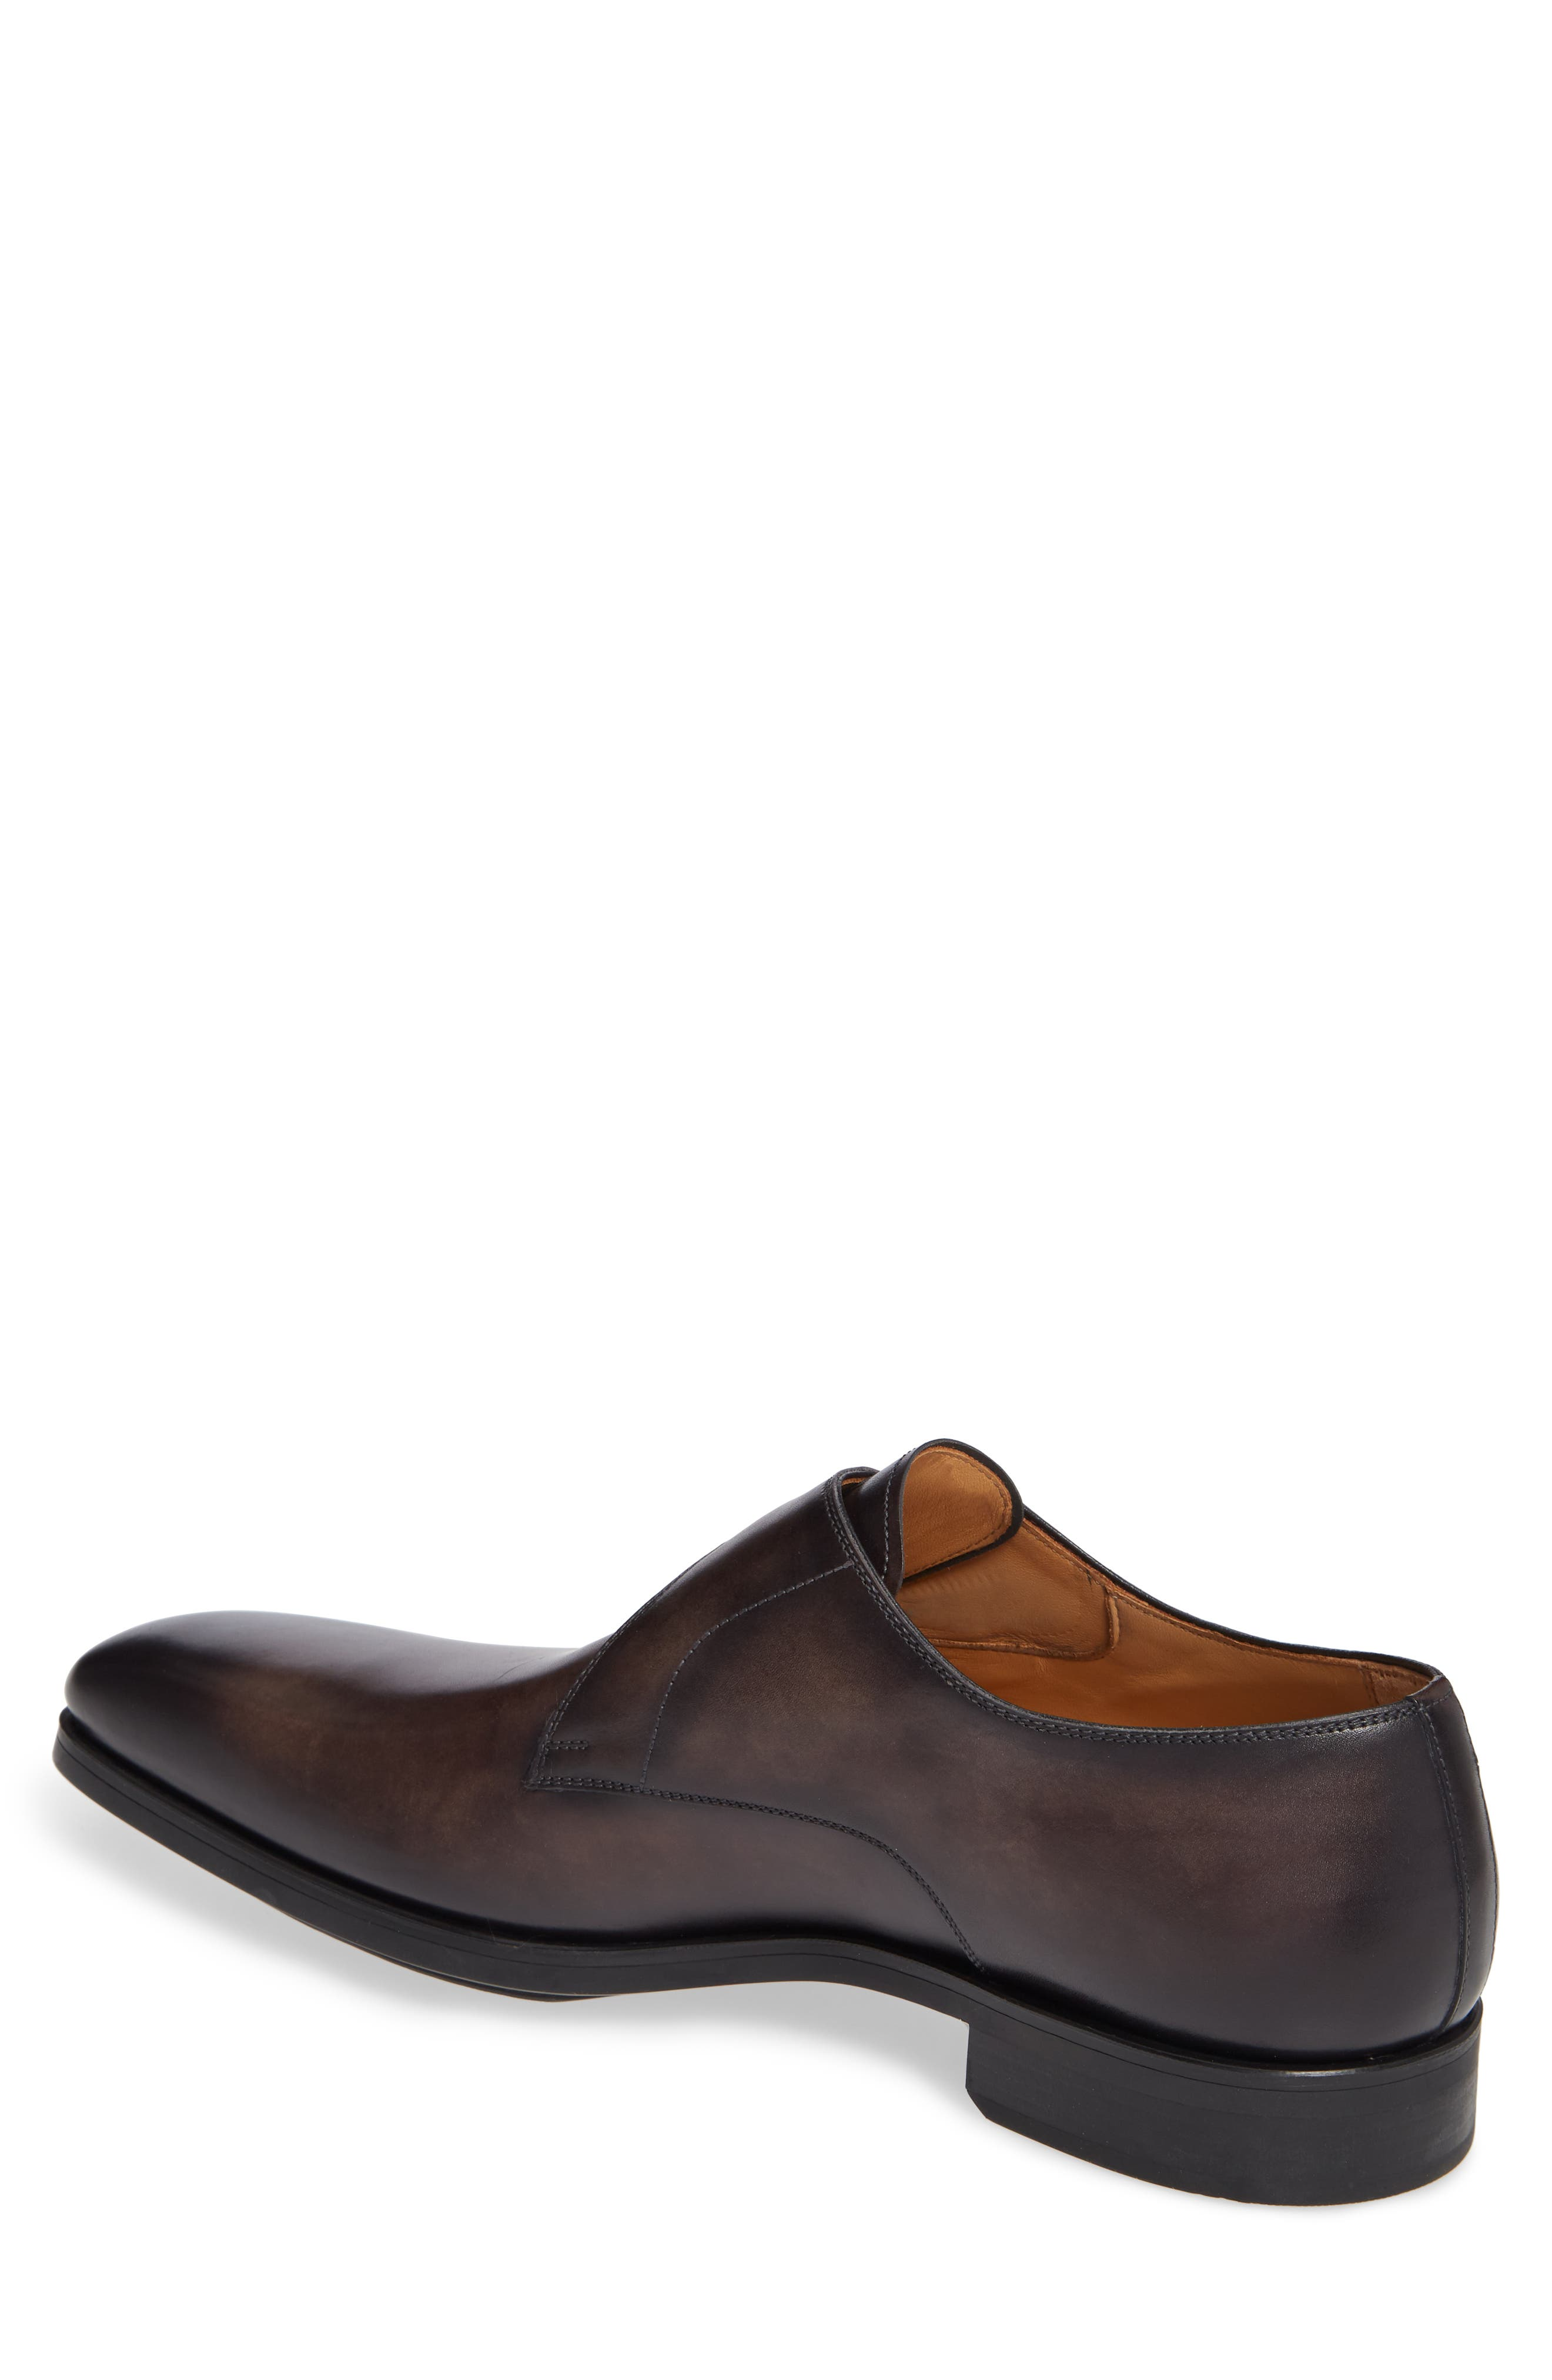 Roddy Monk Strap Shoe,                             Alternate thumbnail 2, color,                             GREY LEATHER